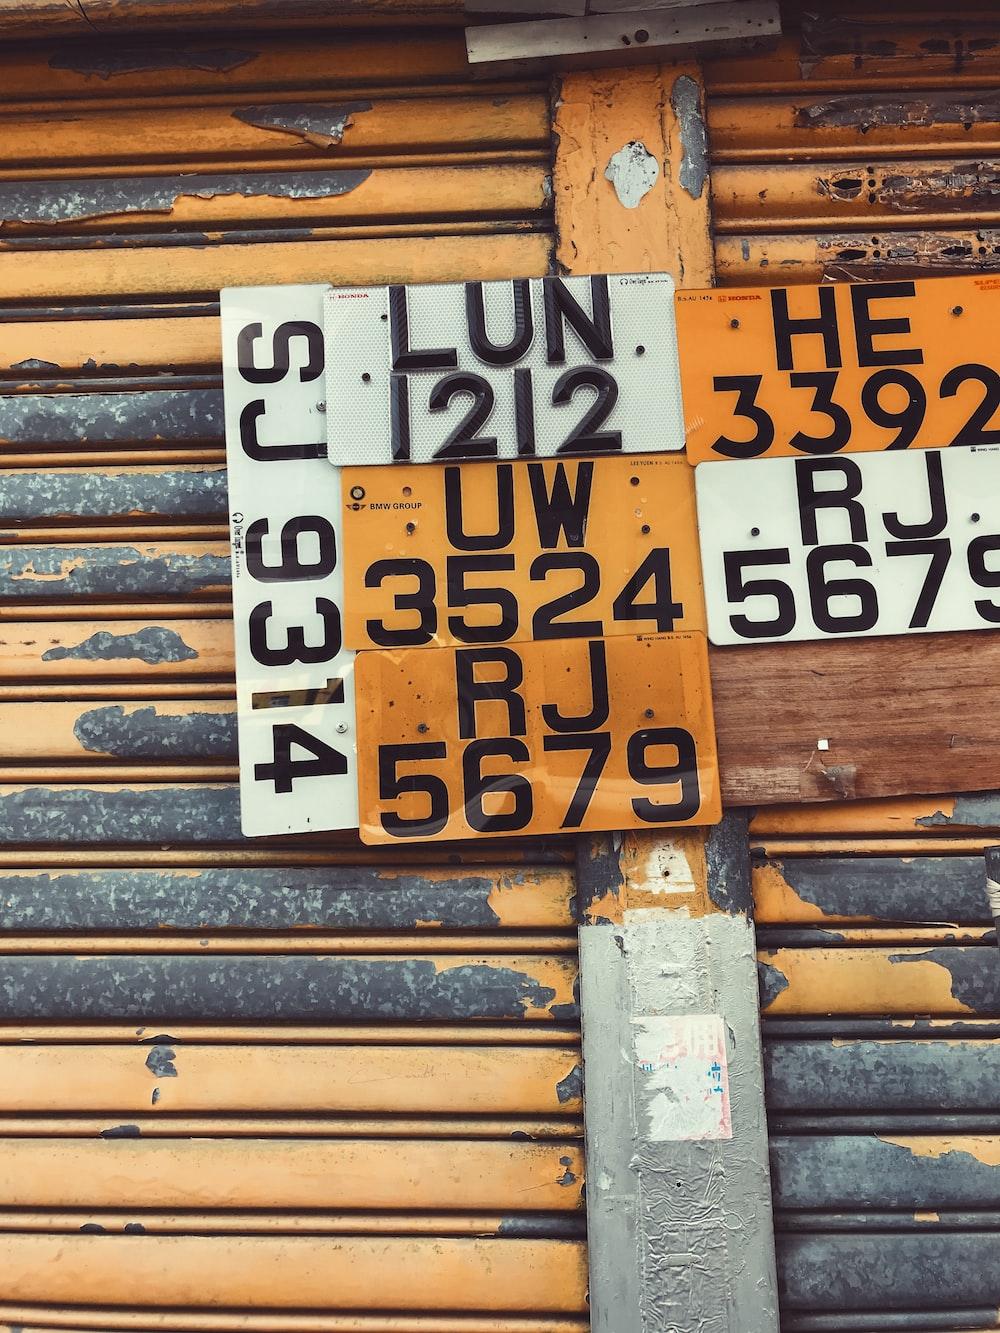 assorted license plates hanging on roller shutter